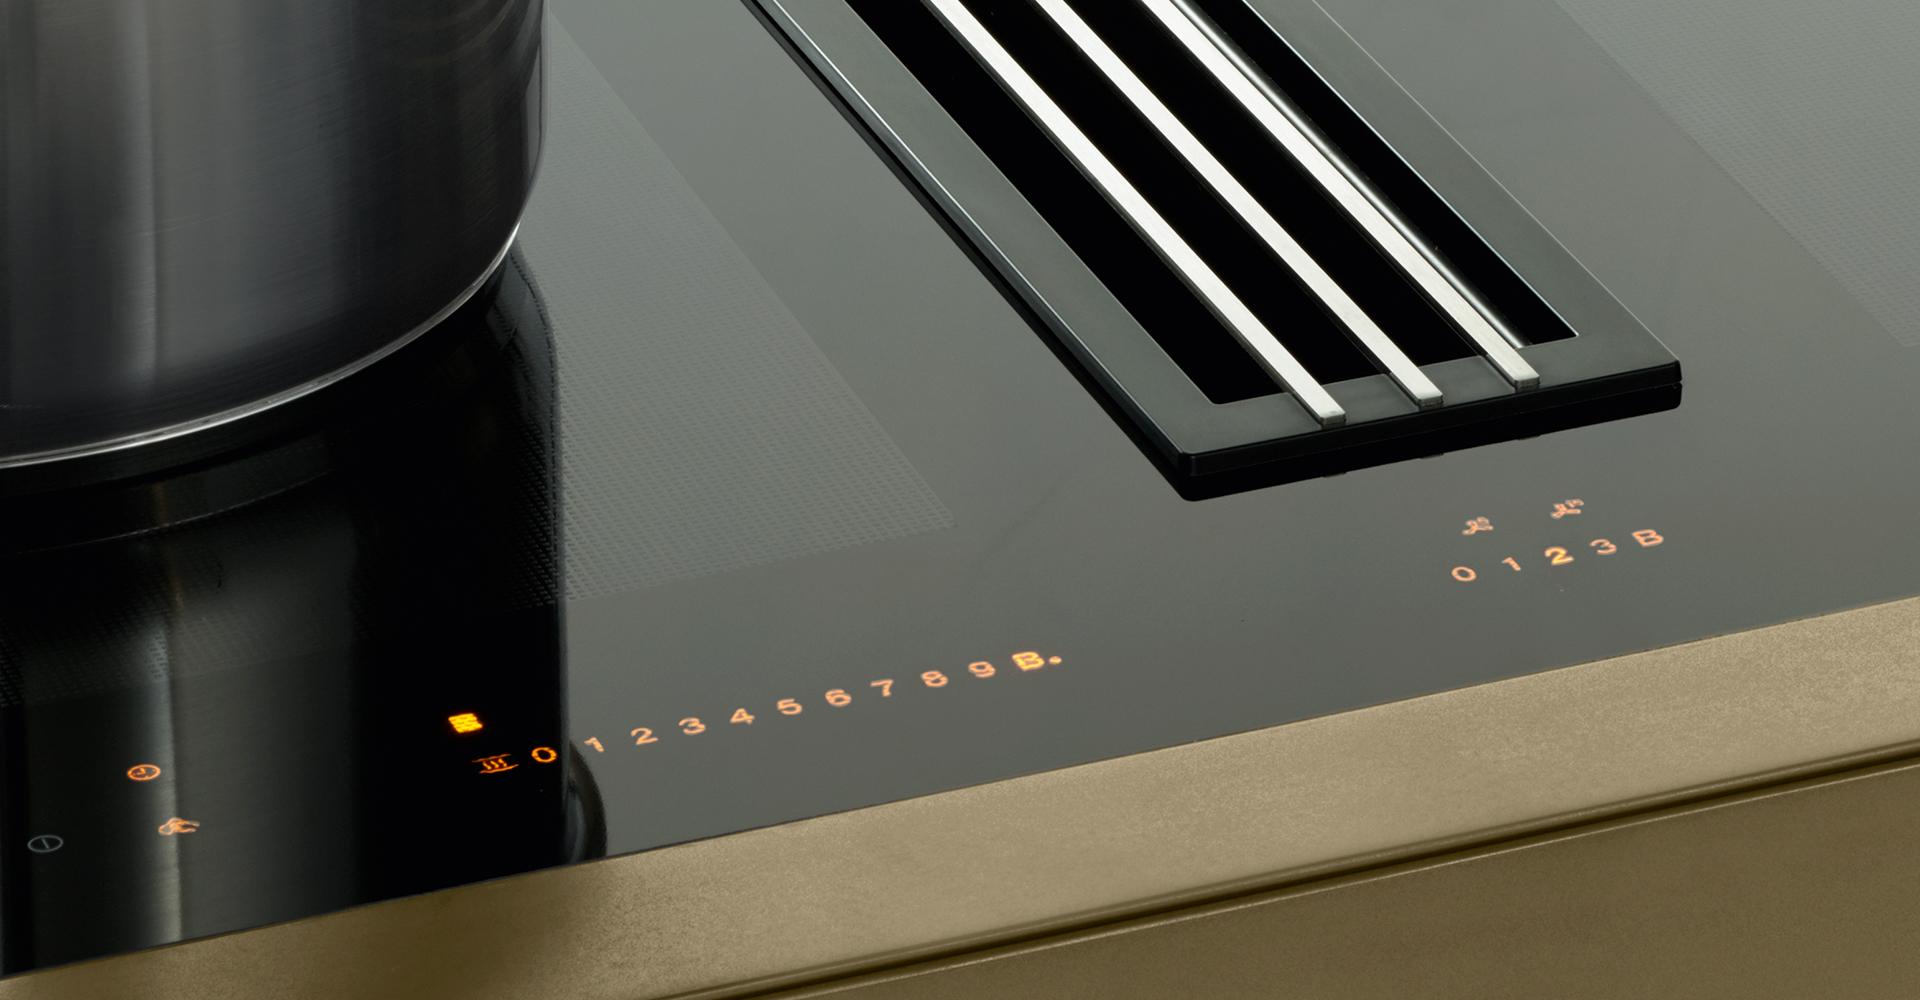 miele induktionskochfelder mit integriertem dunstabzug twoinone. Black Bedroom Furniture Sets. Home Design Ideas